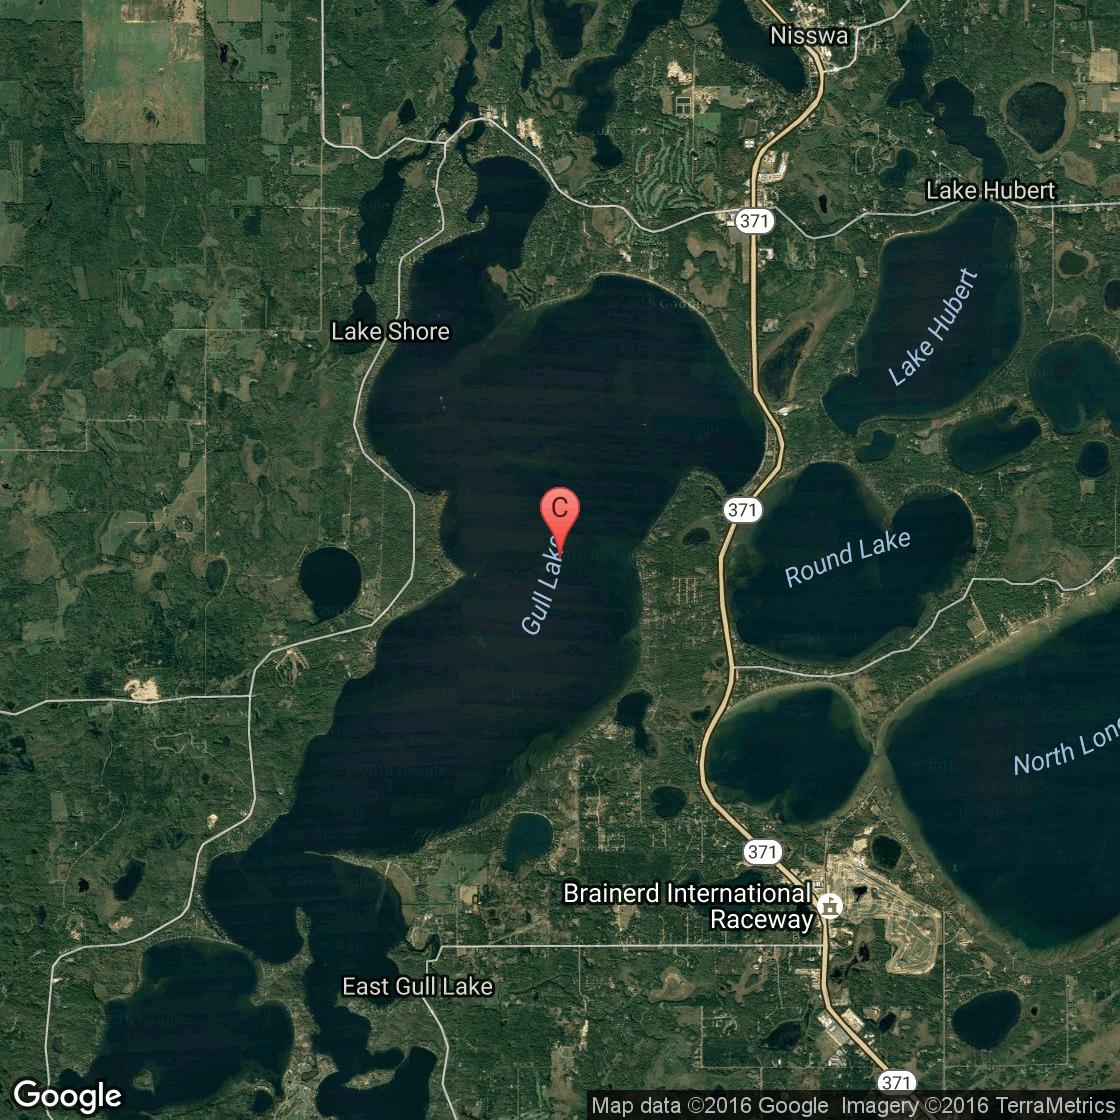 Ice fishing on gull lake minnesota usa today for Fishing lake maps